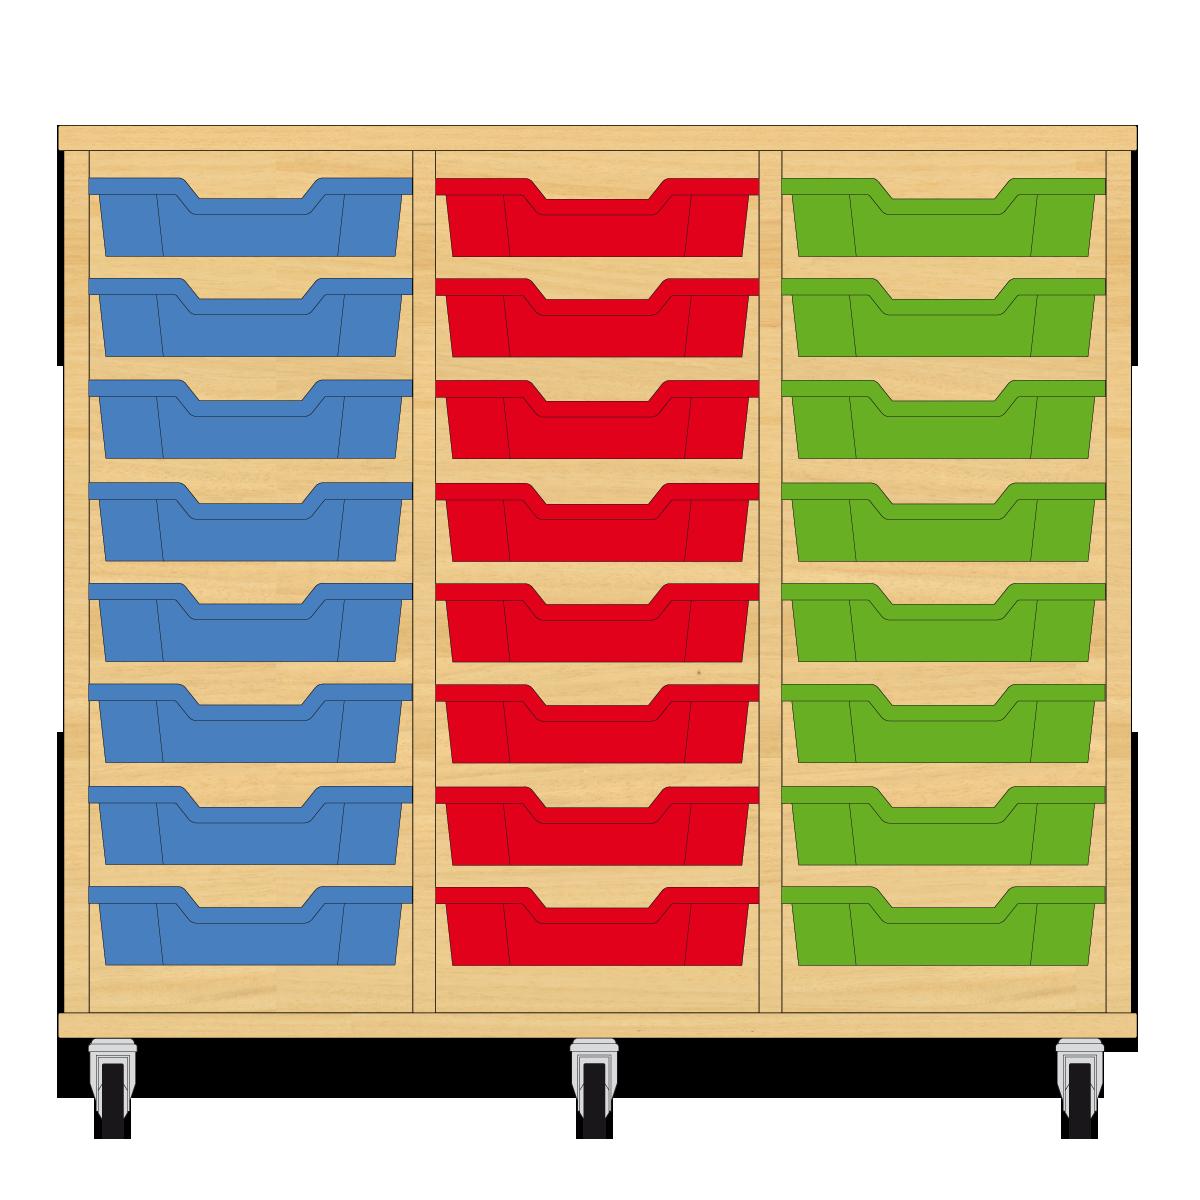 Storix Eigendomskast beuken 3 kol. 8 laden blauw-rood-groen